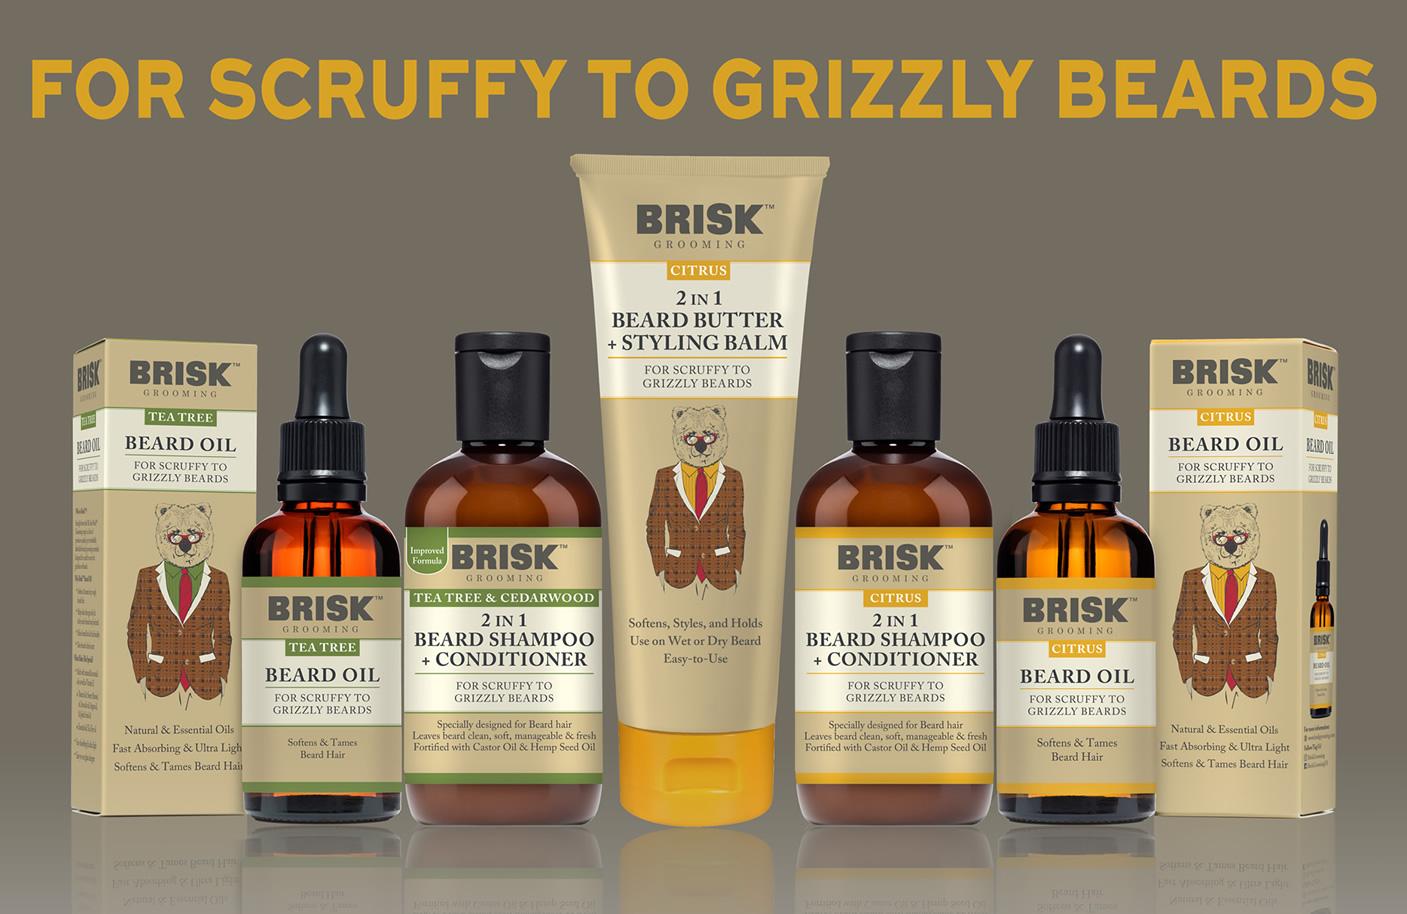 Brisk Grooming - Beard Oil, Shampoo, Beard Butter, Styling Balm